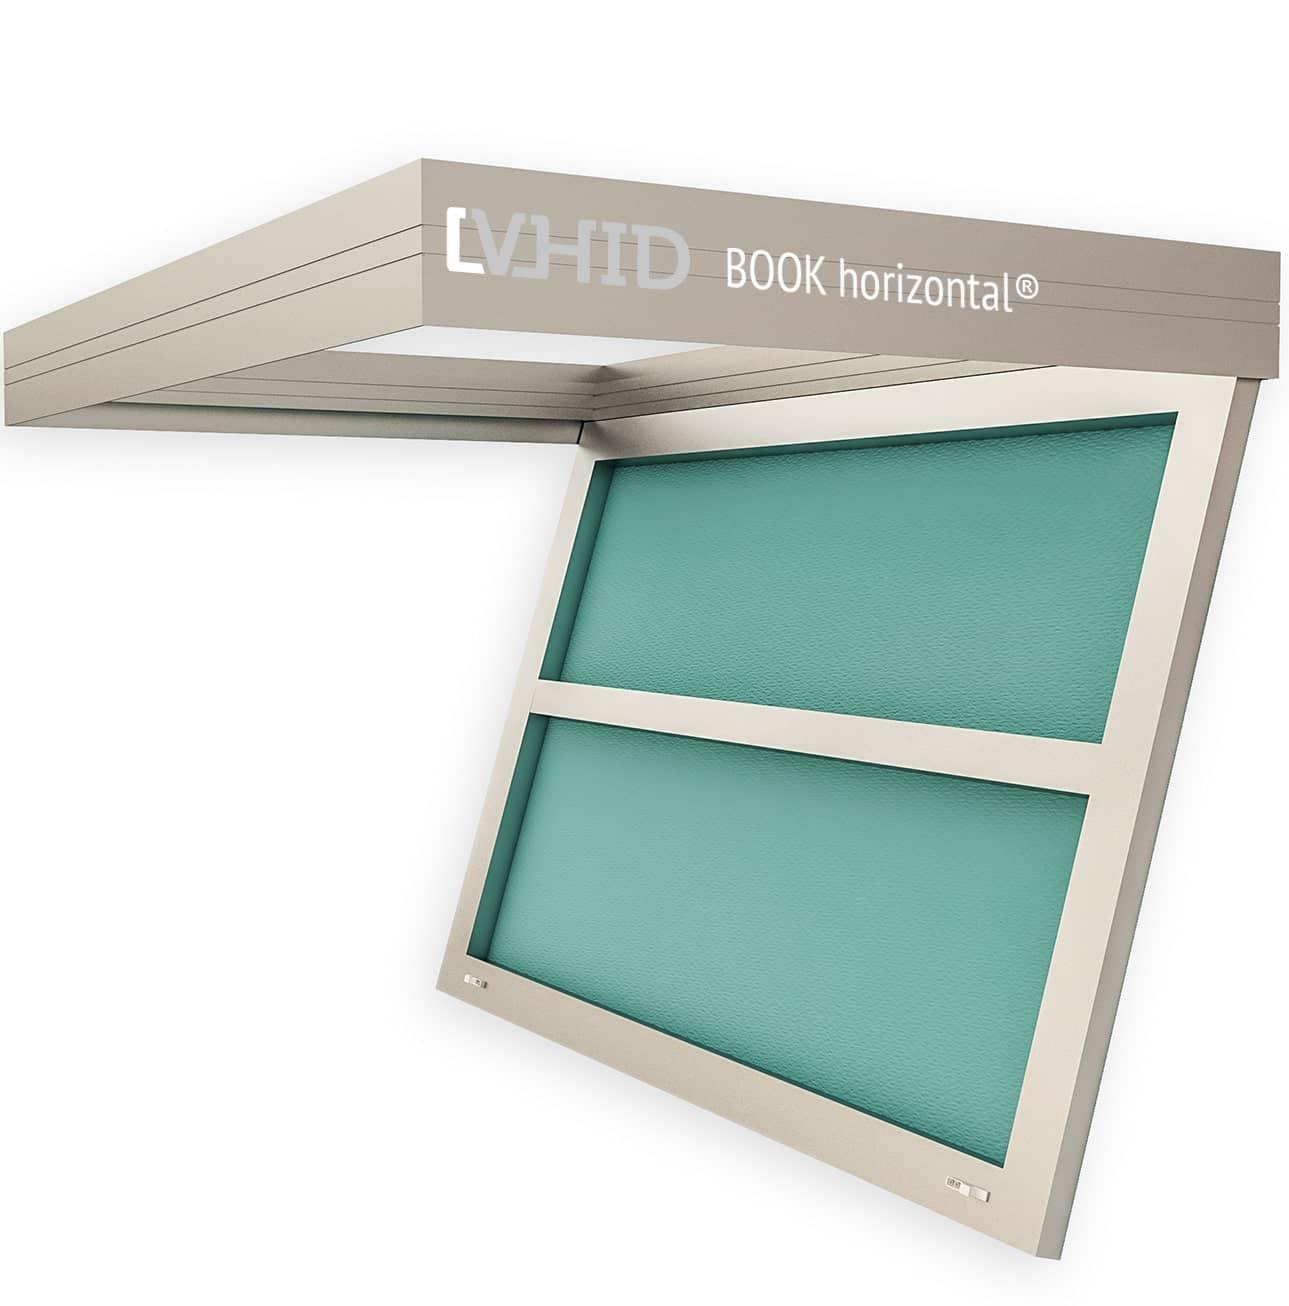 BOOK-horizontal-vhid